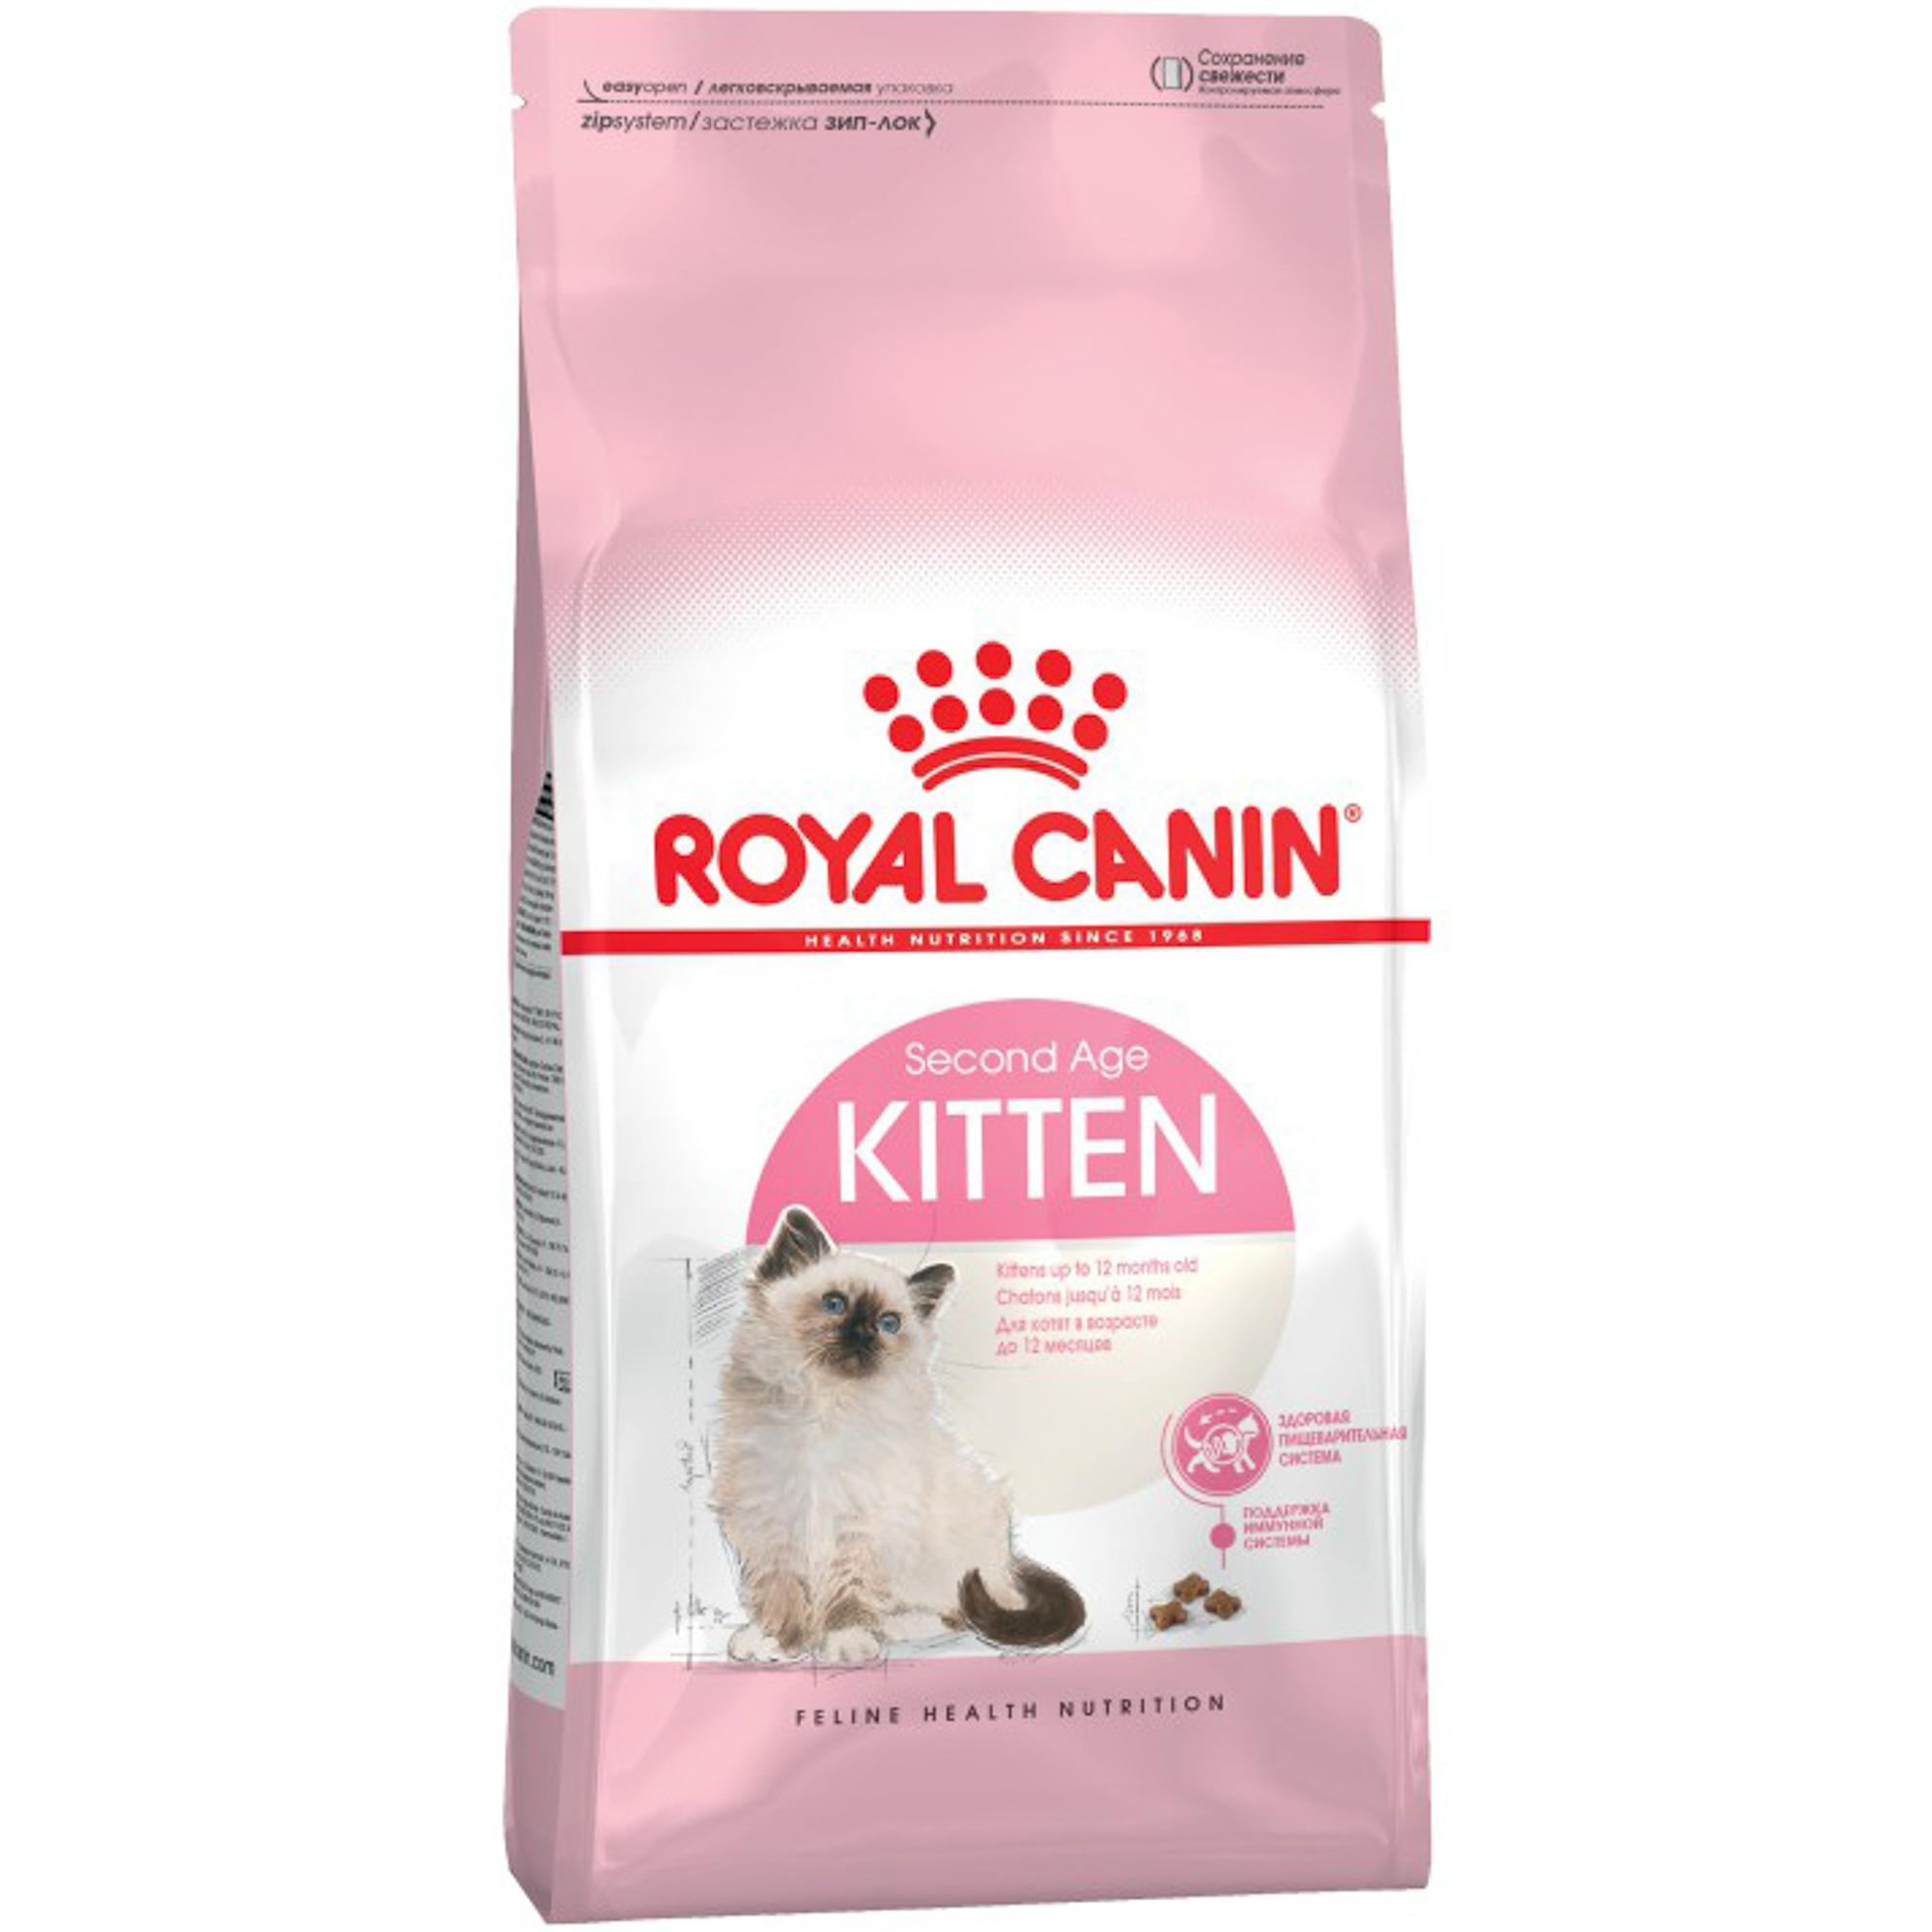 Корм для кошек ROYAL CANIN Kitten для котят в возрасте от 4 до 12 месяцев, 2 кг